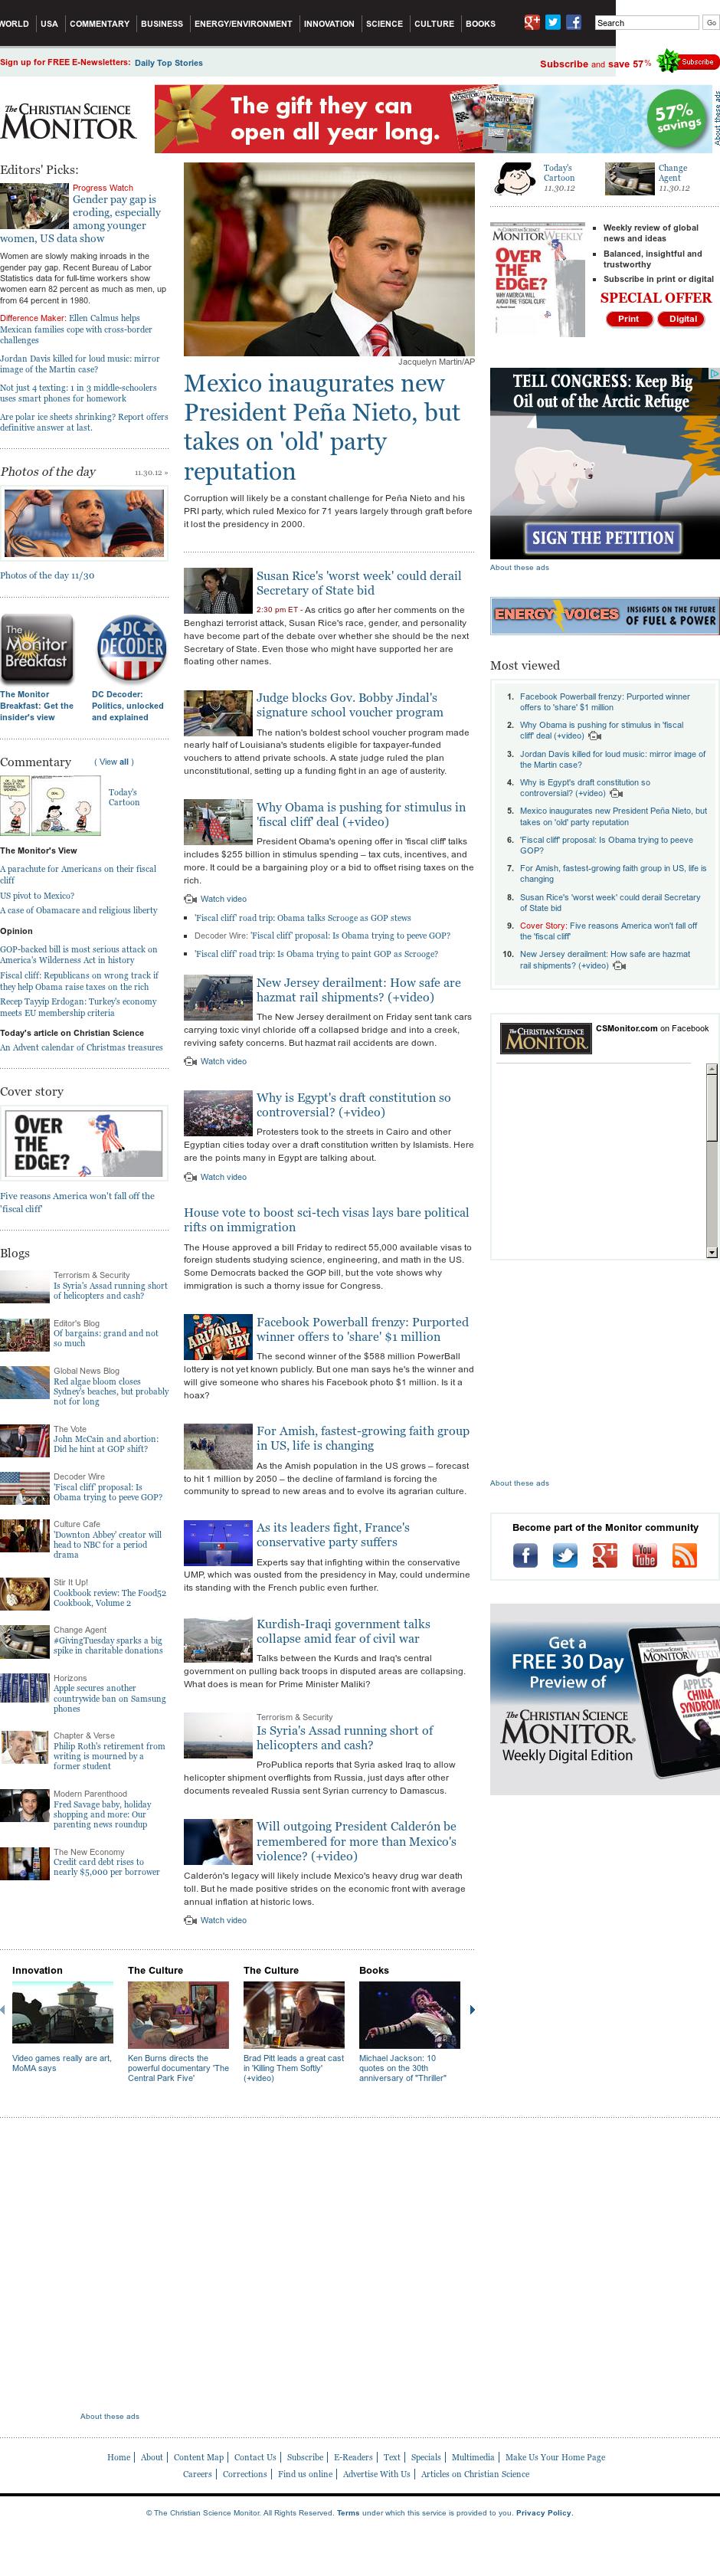 The Christian Science Monitor at Saturday Dec. 1, 2012, 9:06 p.m. UTC